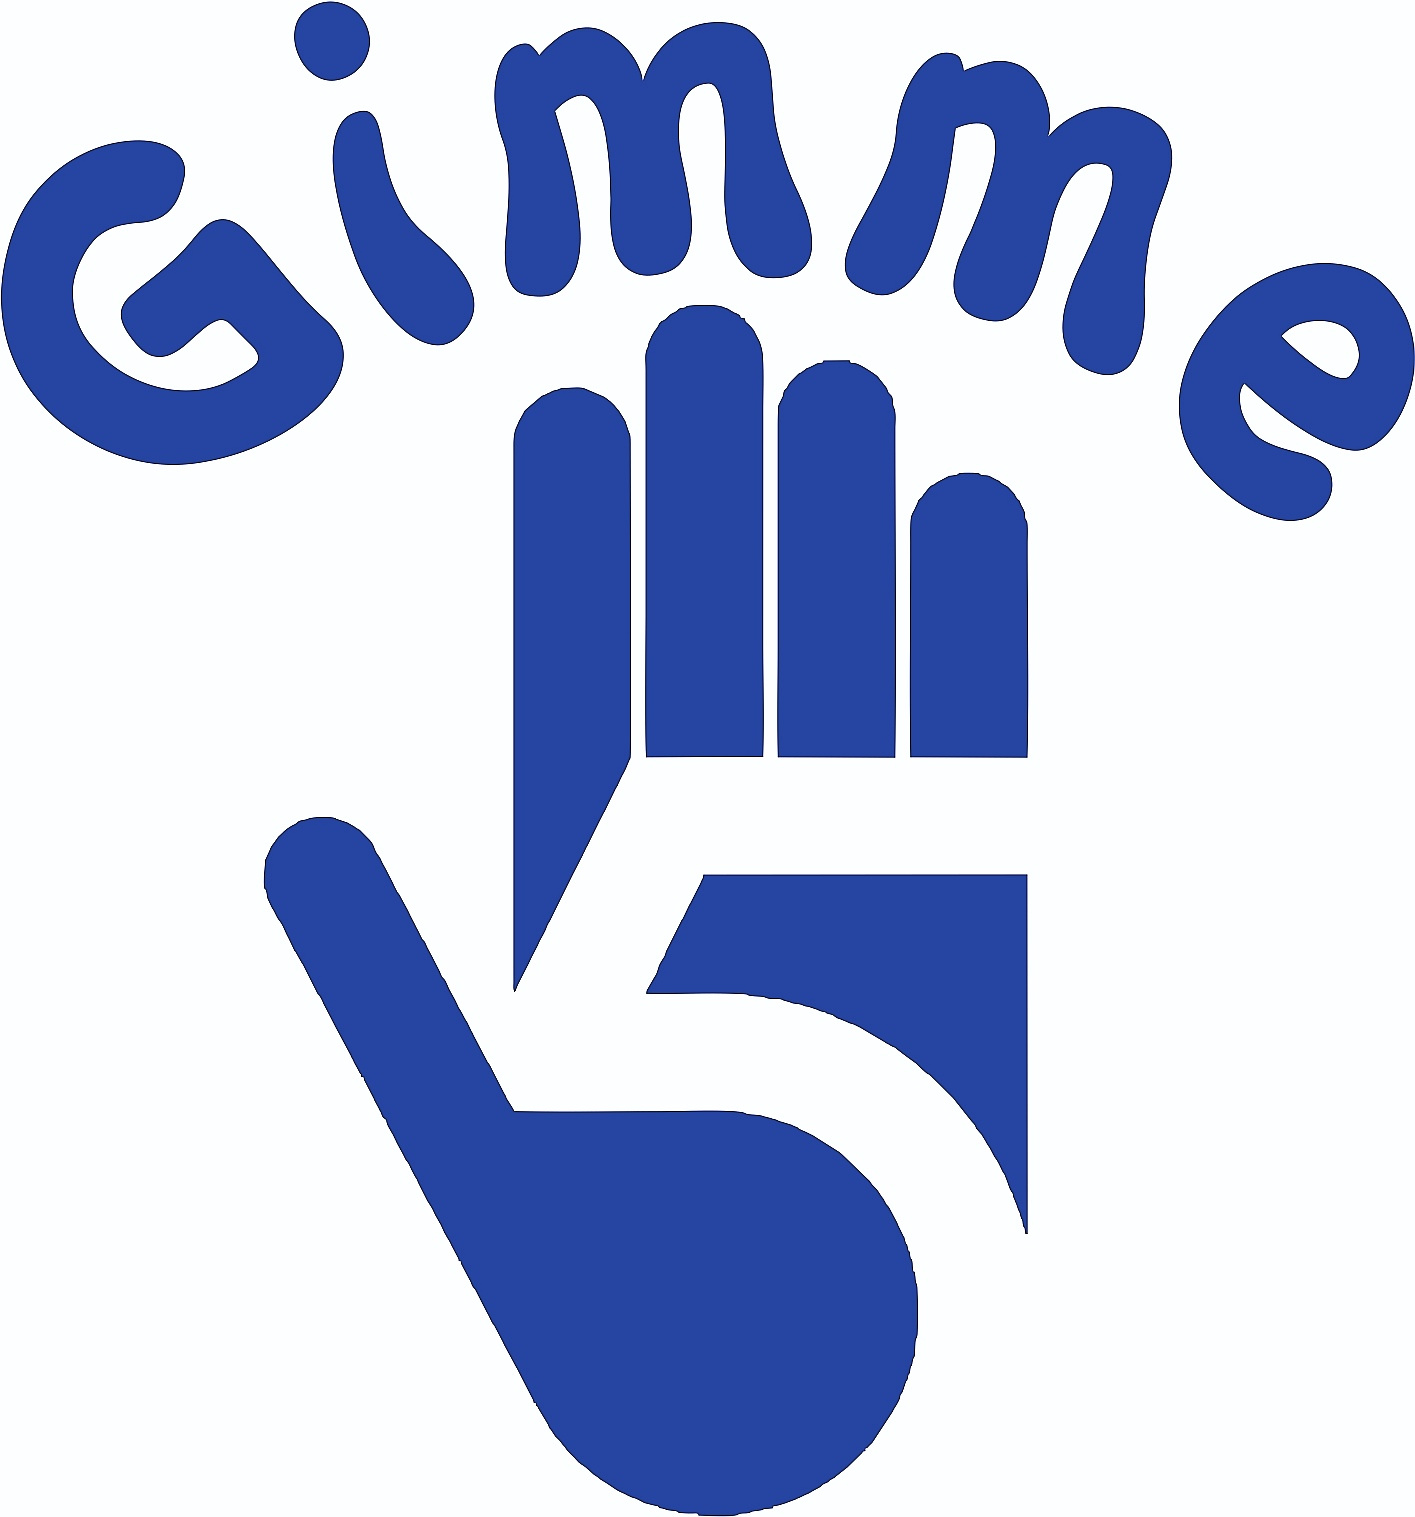 Mallusk Harriers' Gimme 5